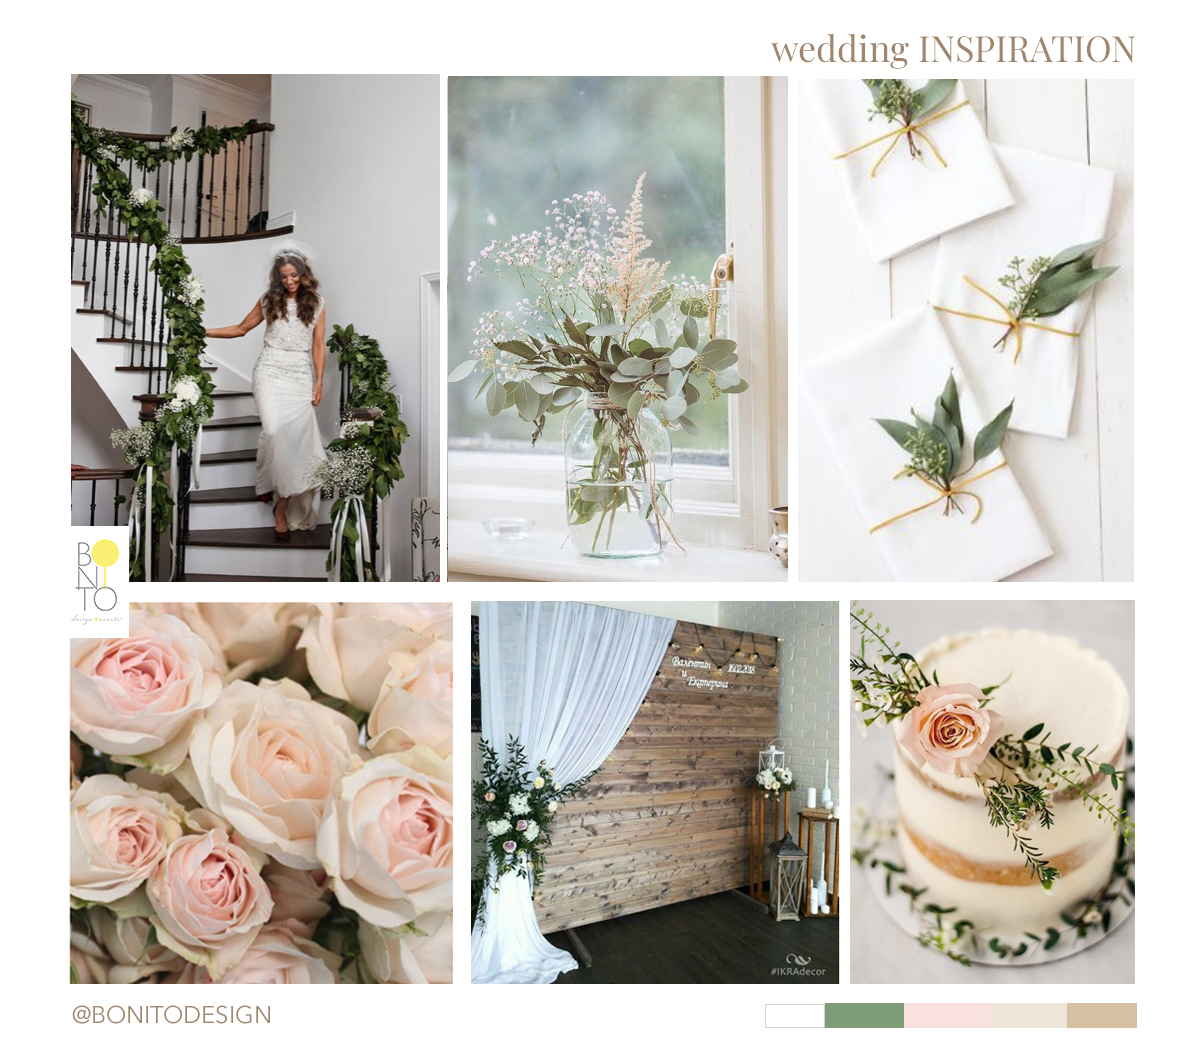 bonito-design-melissa-wedding-inspo.jpg